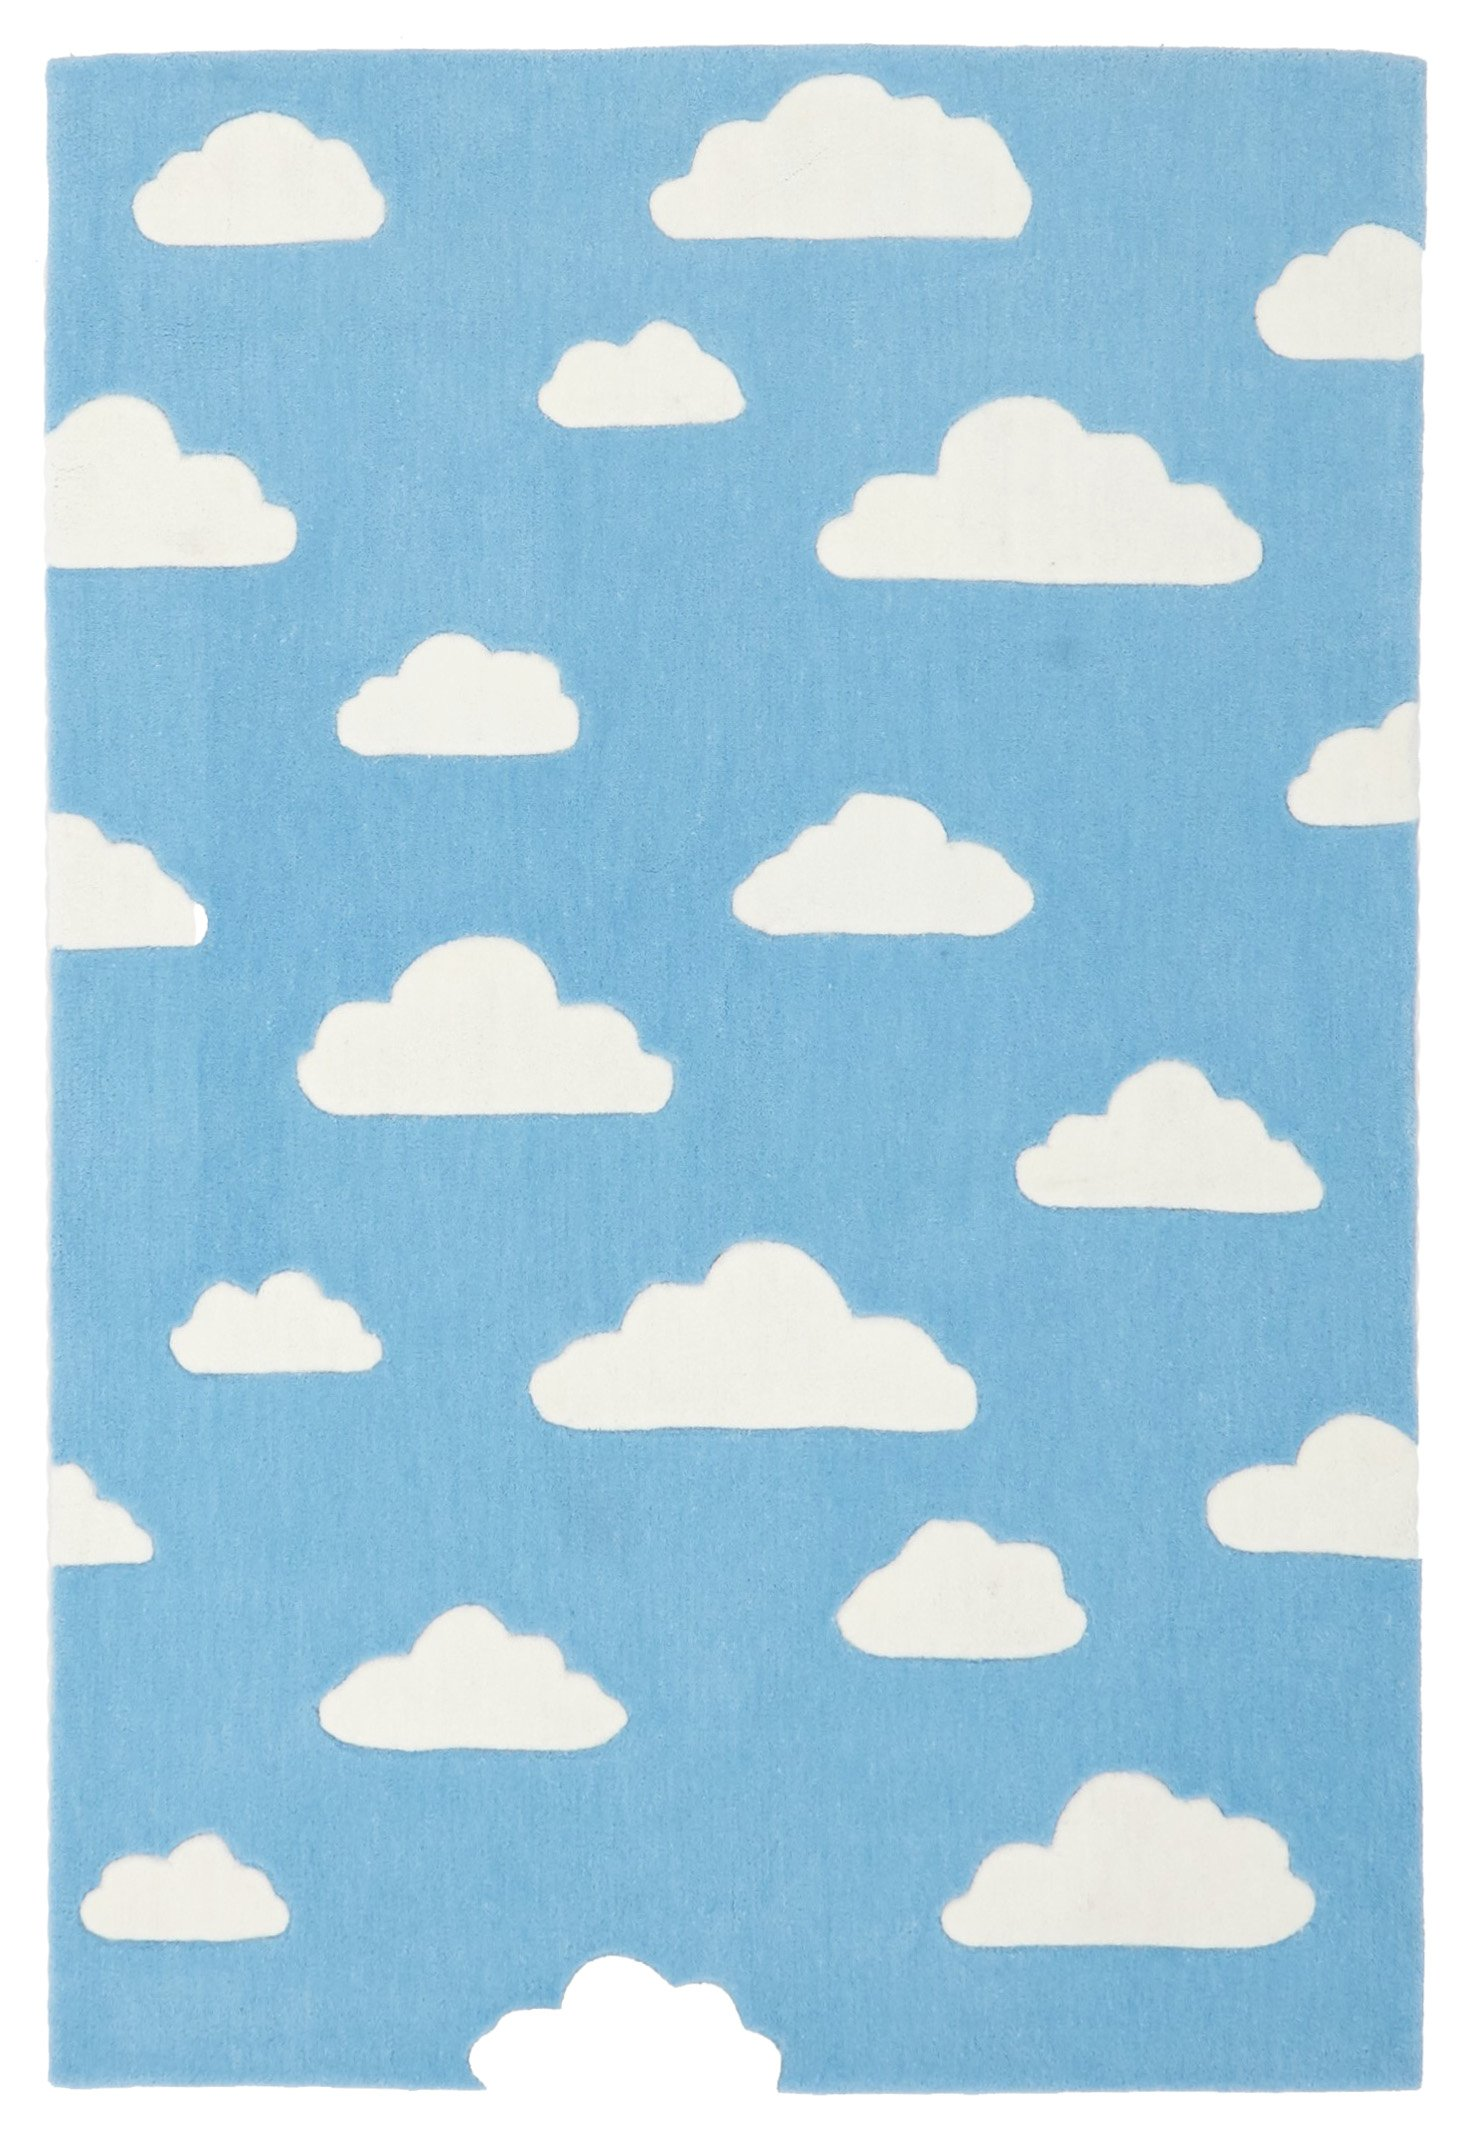 neverland blue u0026 white clouds kids rug ERTWNGJ